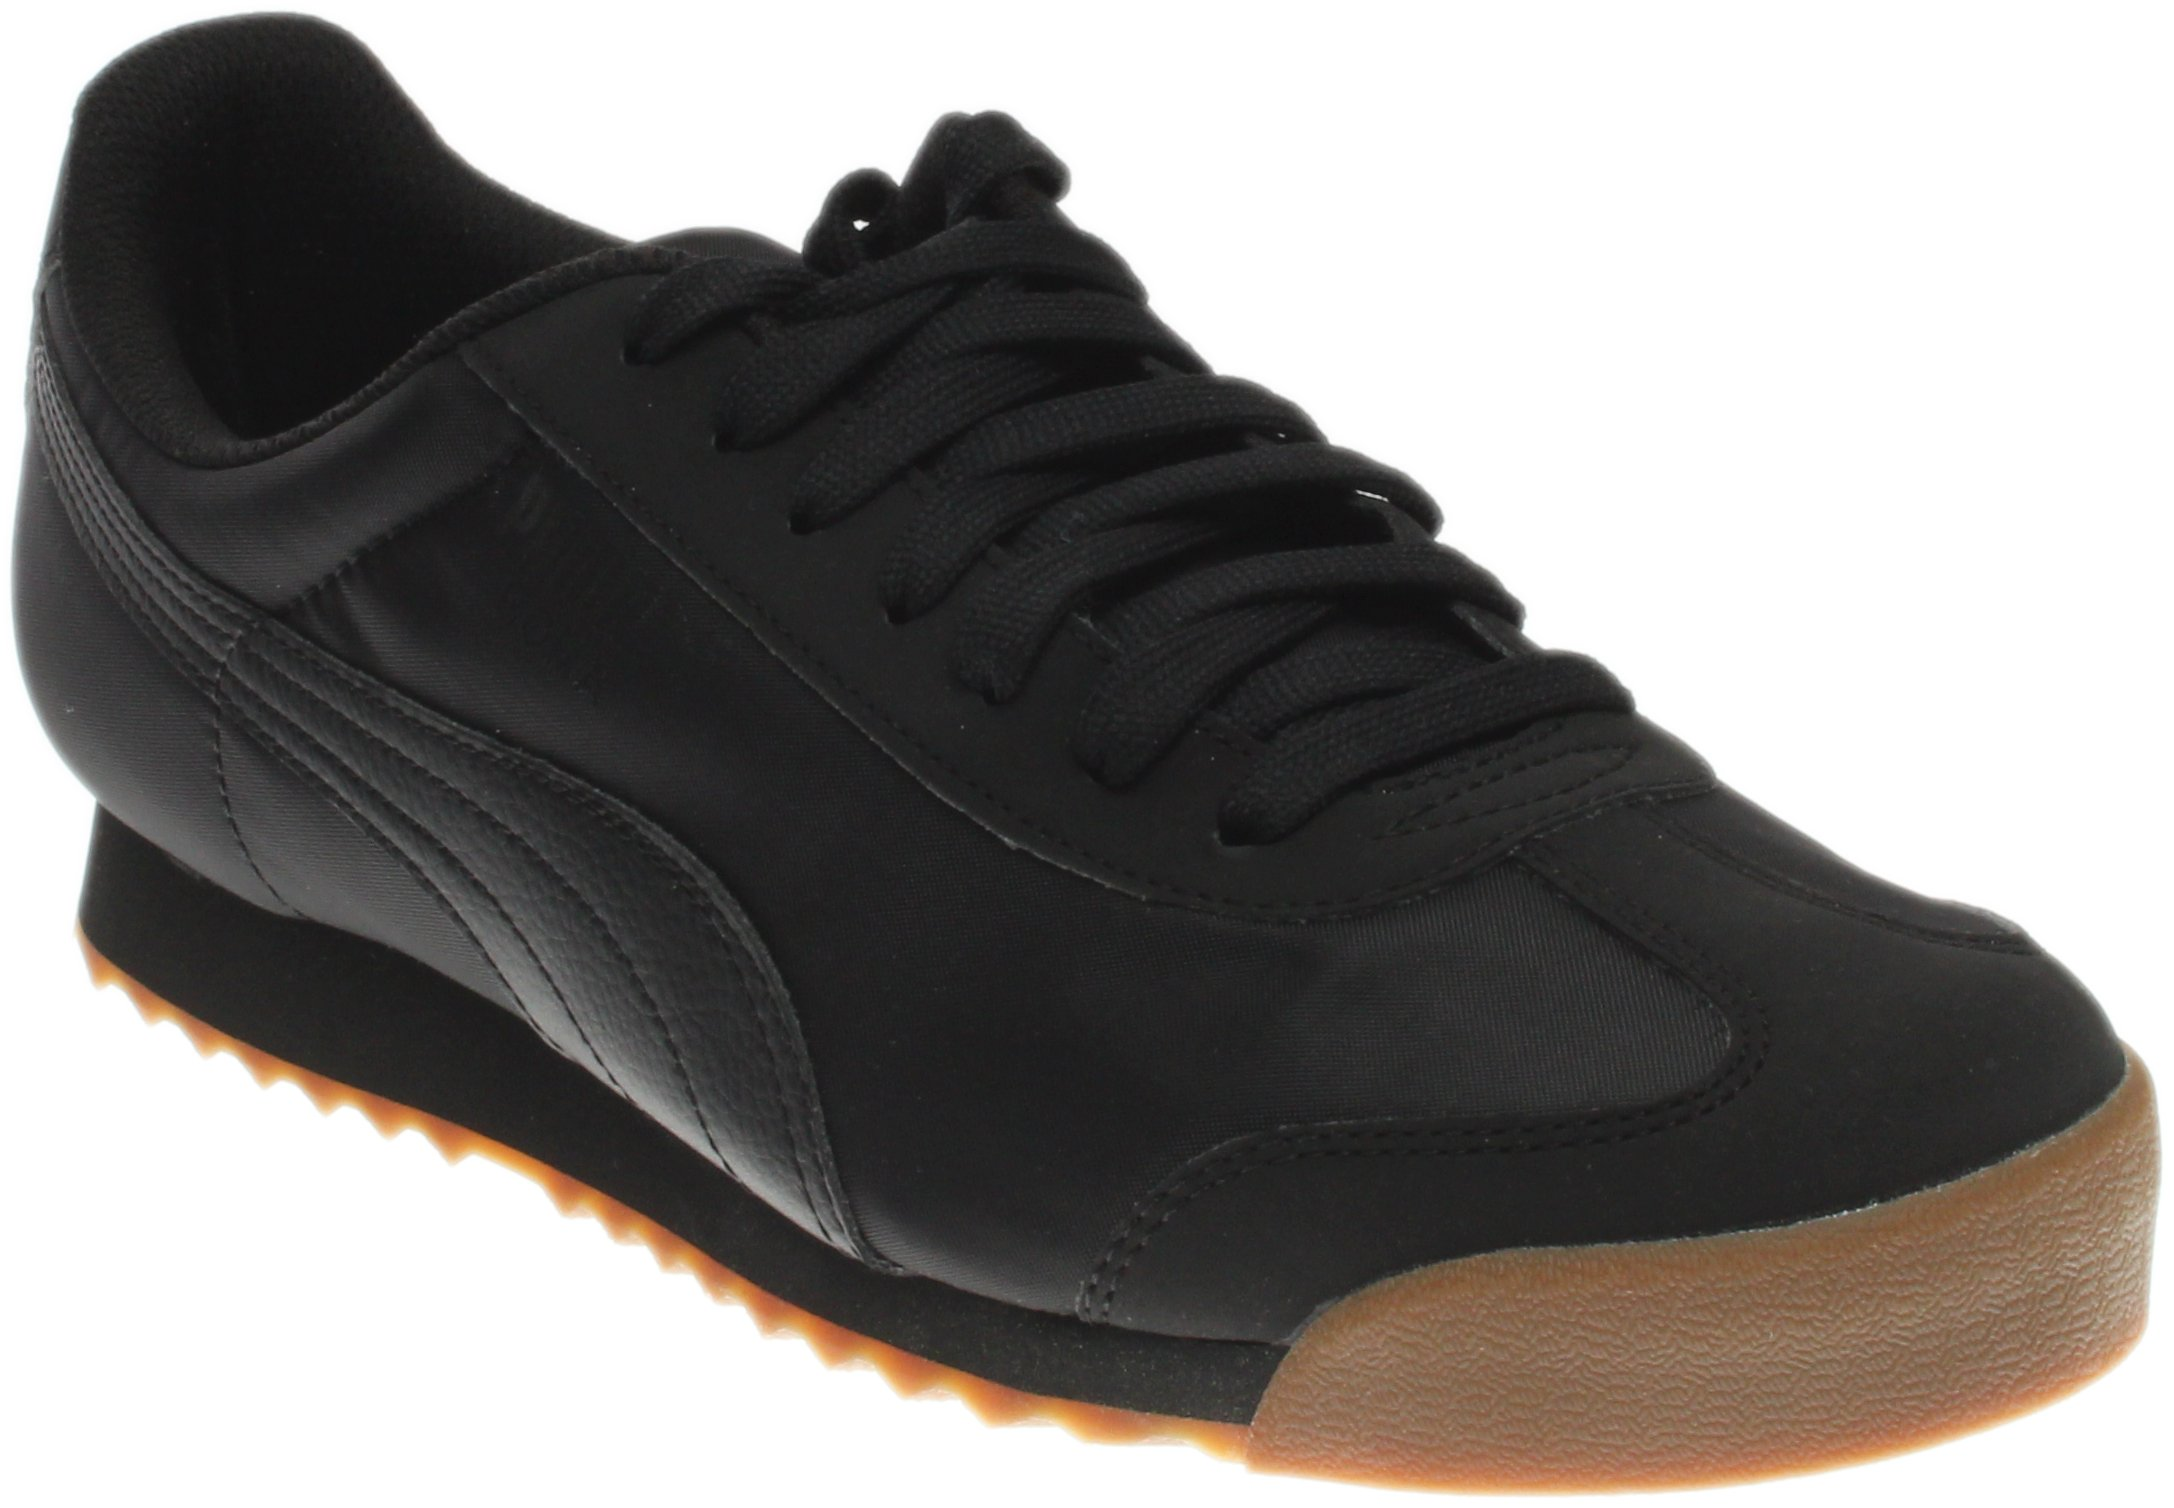 PUMA Men's Roma Basic Summer Fashion Sneaker, Black, 11 M US